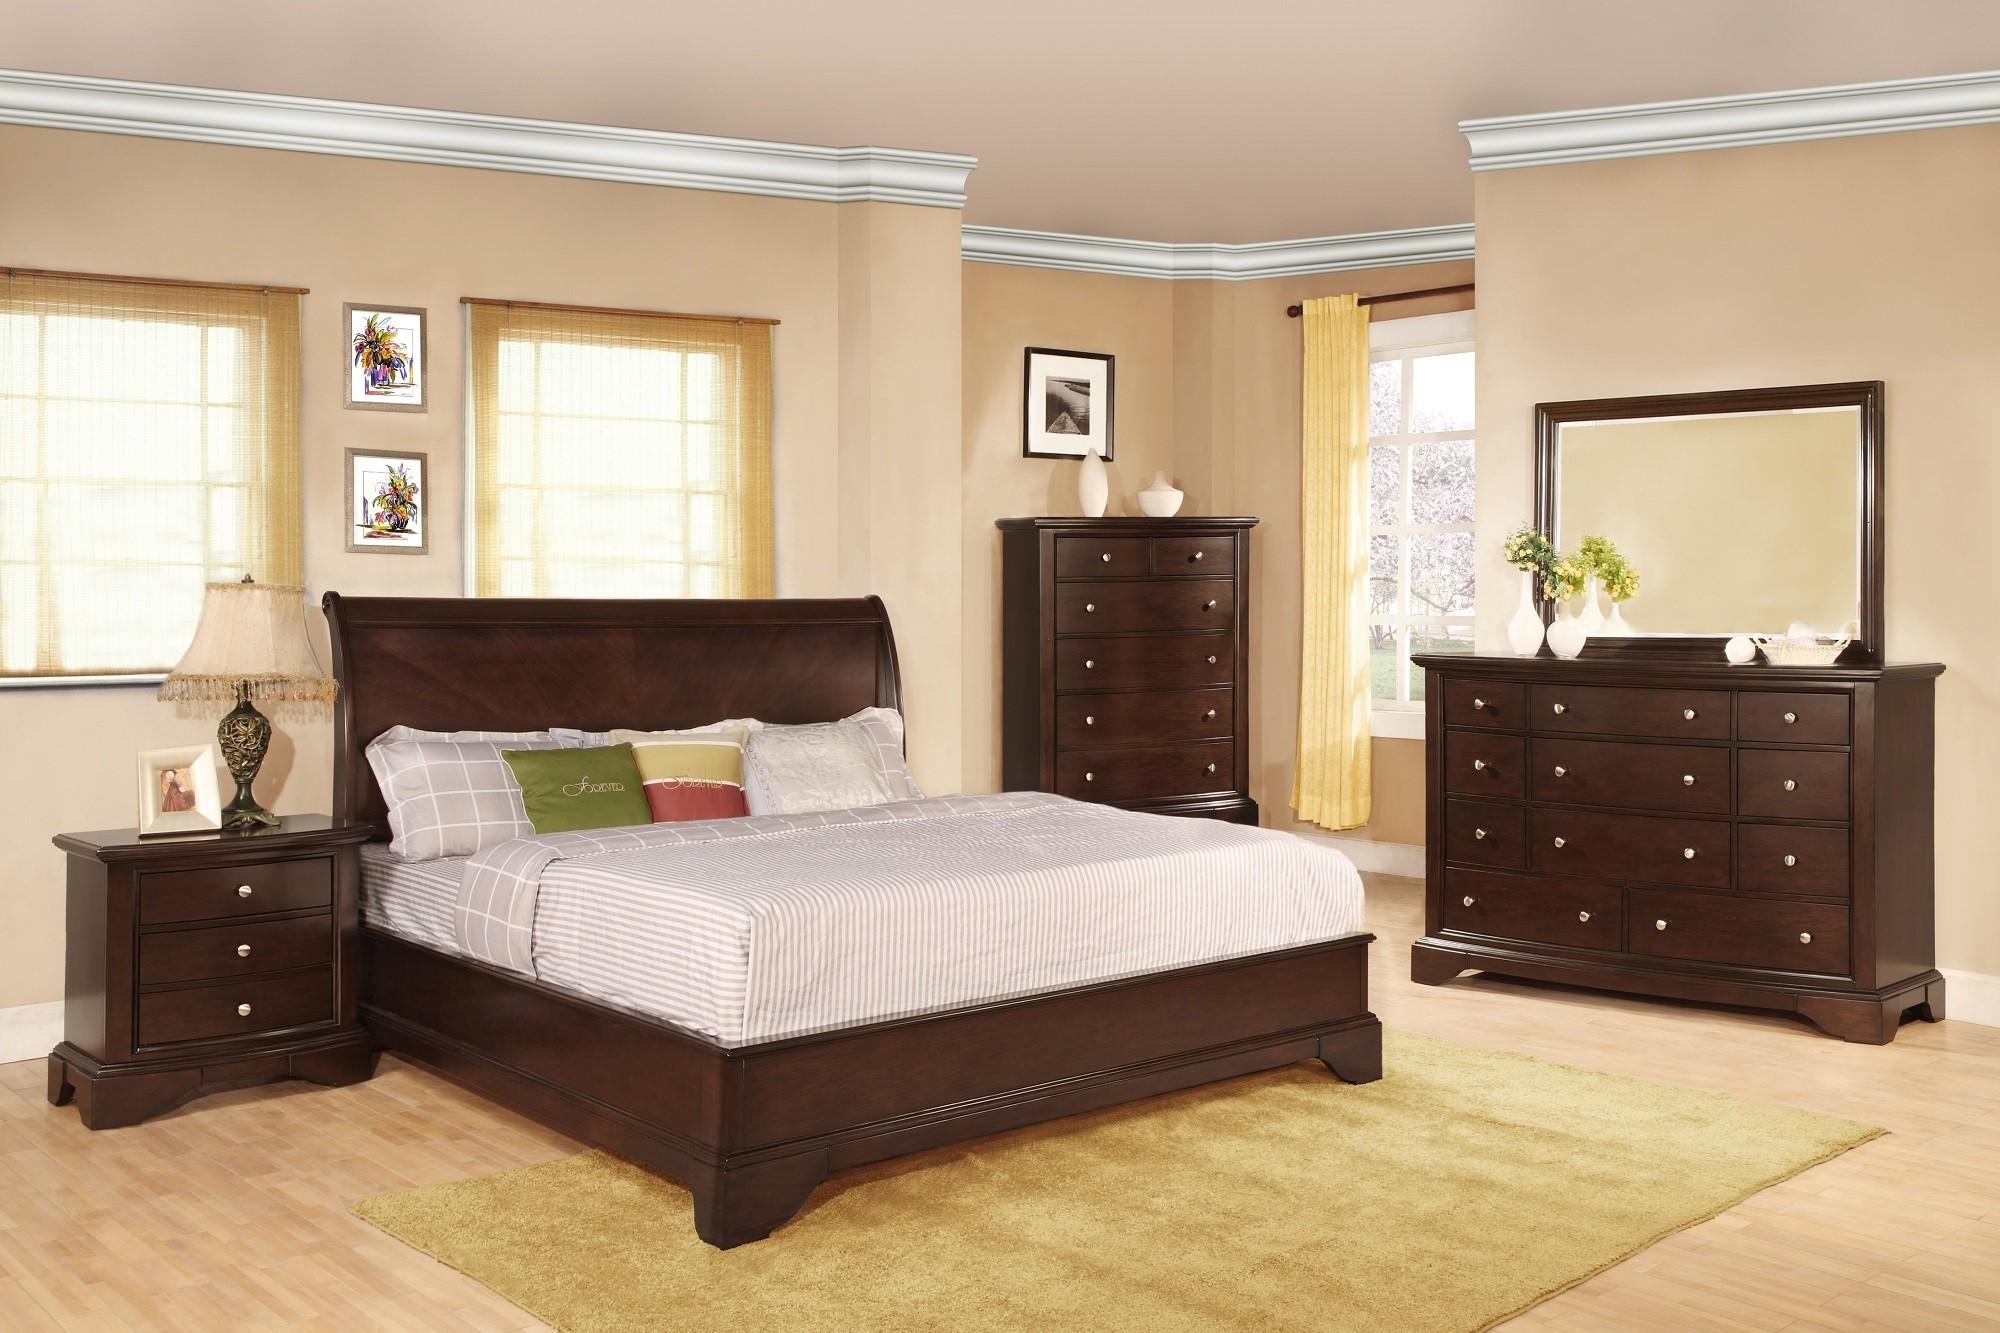 بالصور غرف نوم حديثه , احدث اشكال غرف النوم 3947 7